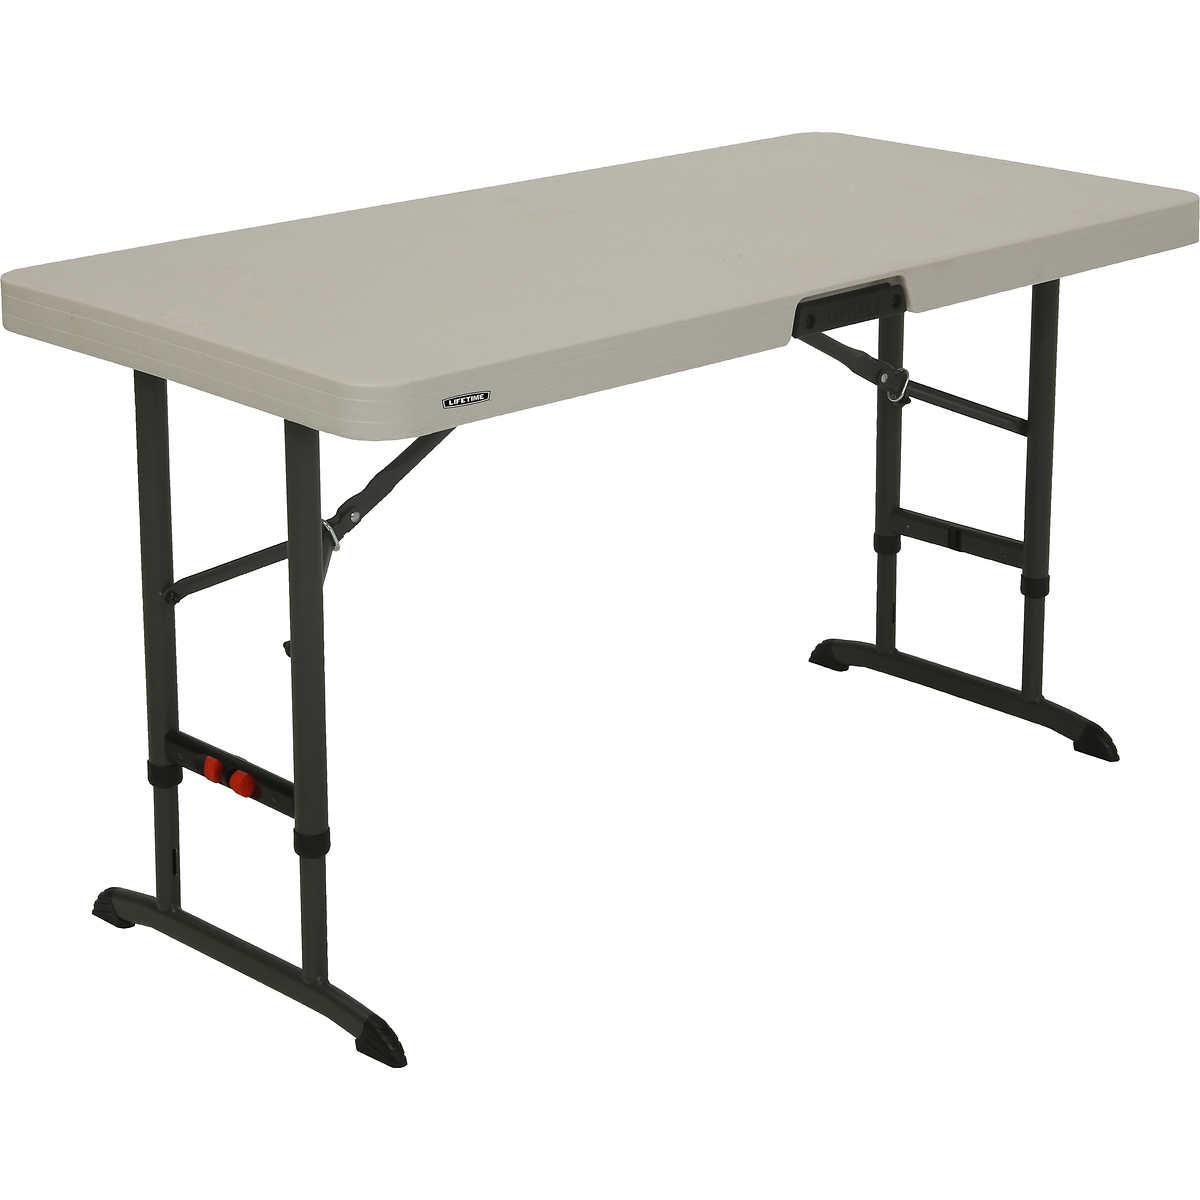 "Lifetime Adjustable Height Folding Table 48""L x 24""W x 24 34""H"